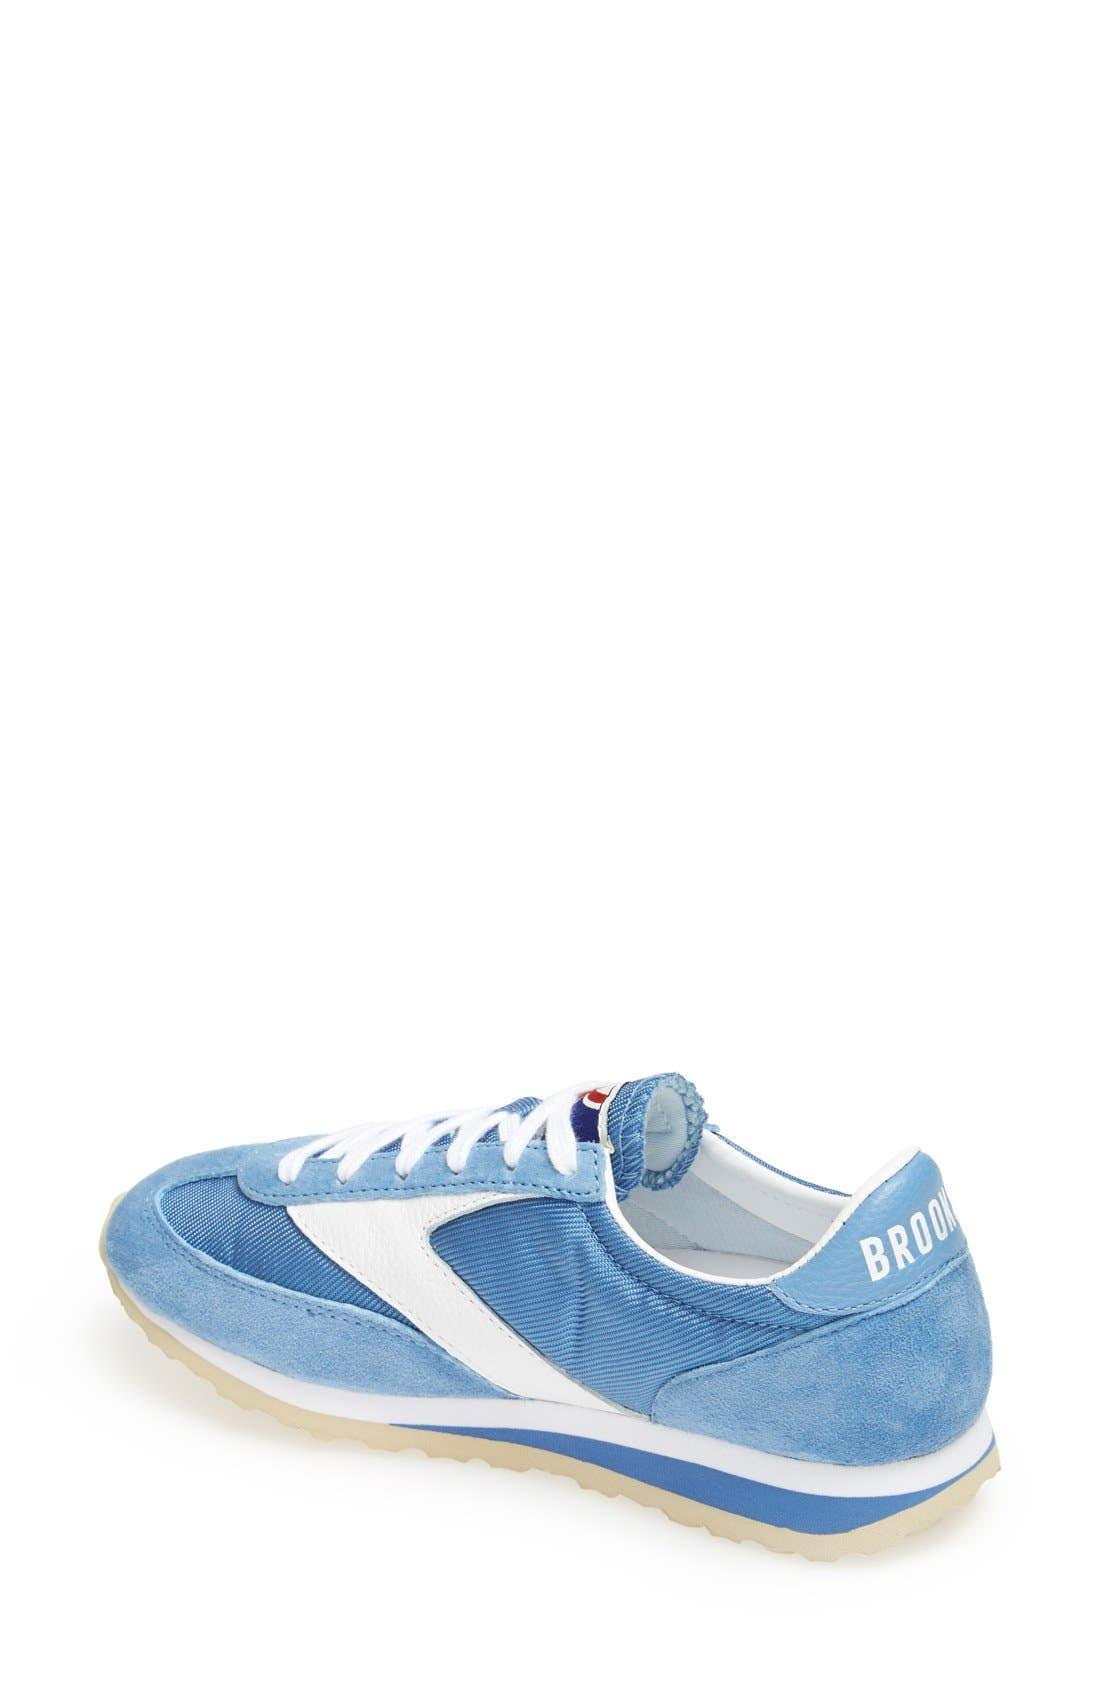 'Vanguard' Sneaker,                             Alternate thumbnail 70, color,